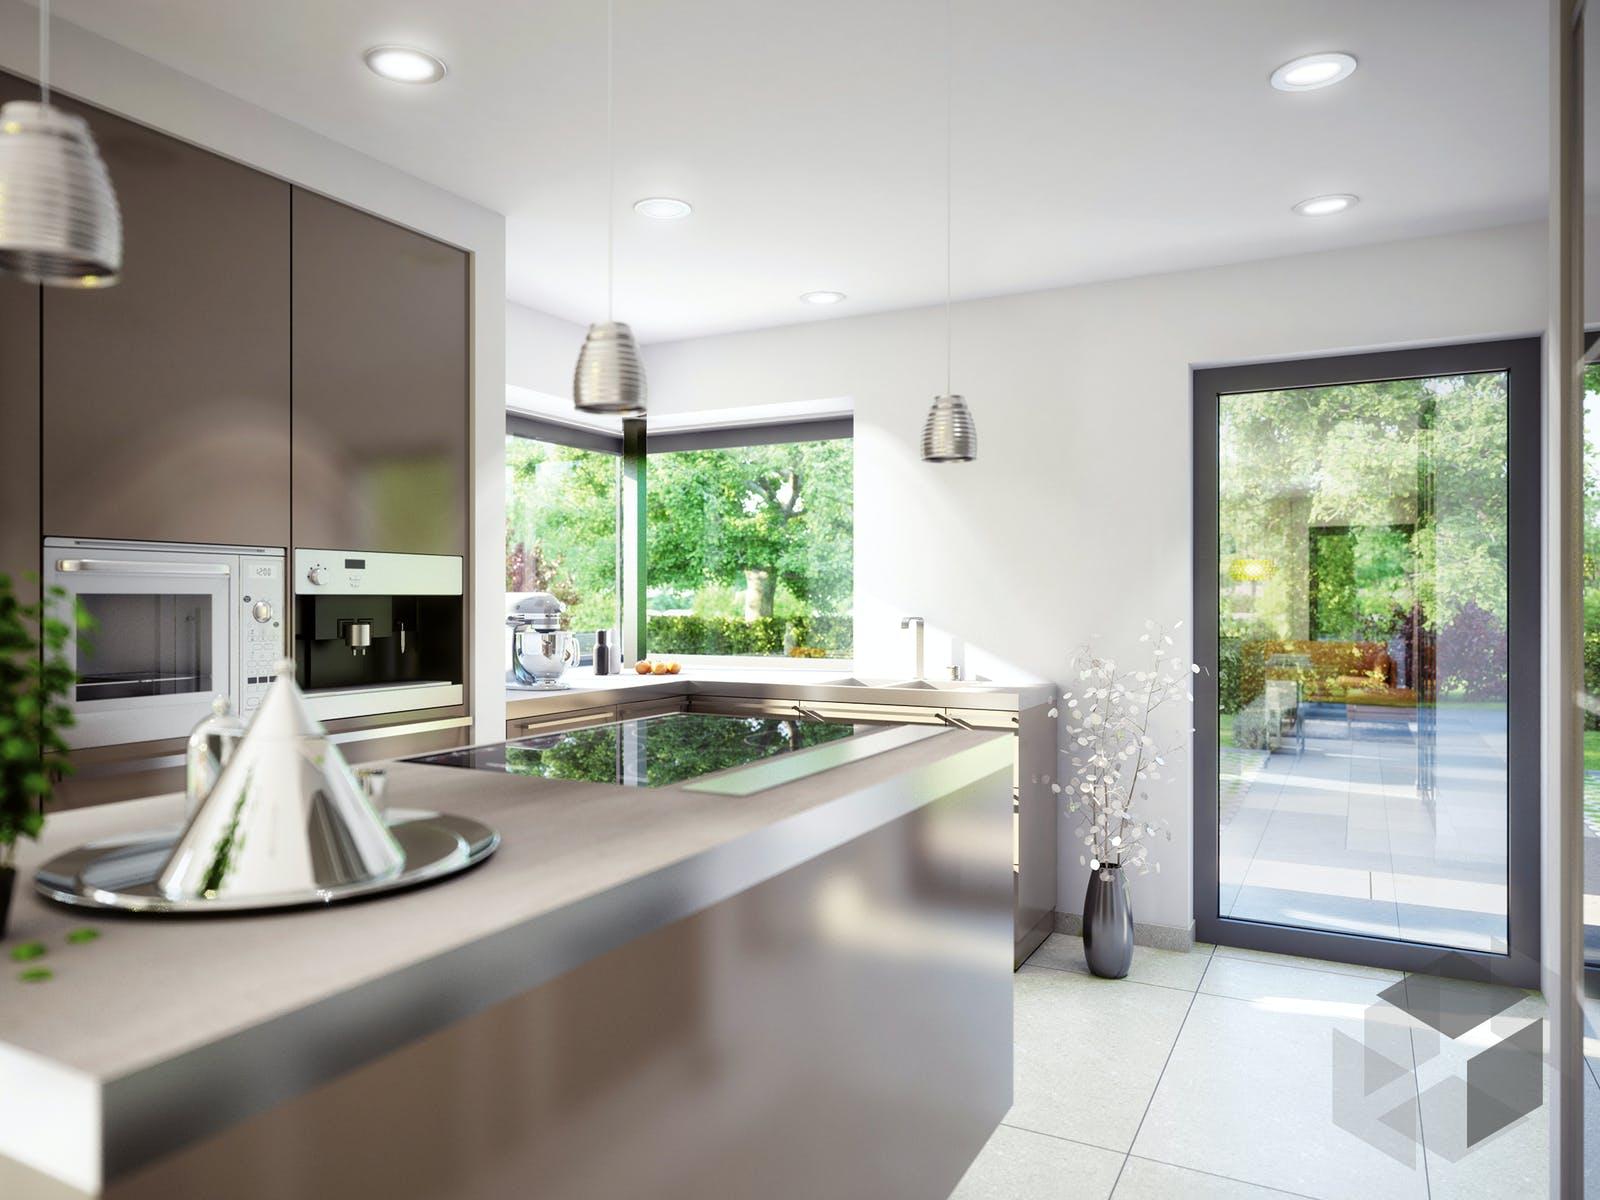 concept m 152 pfullingen von bien zenker komplette daten bersicht. Black Bedroom Furniture Sets. Home Design Ideas